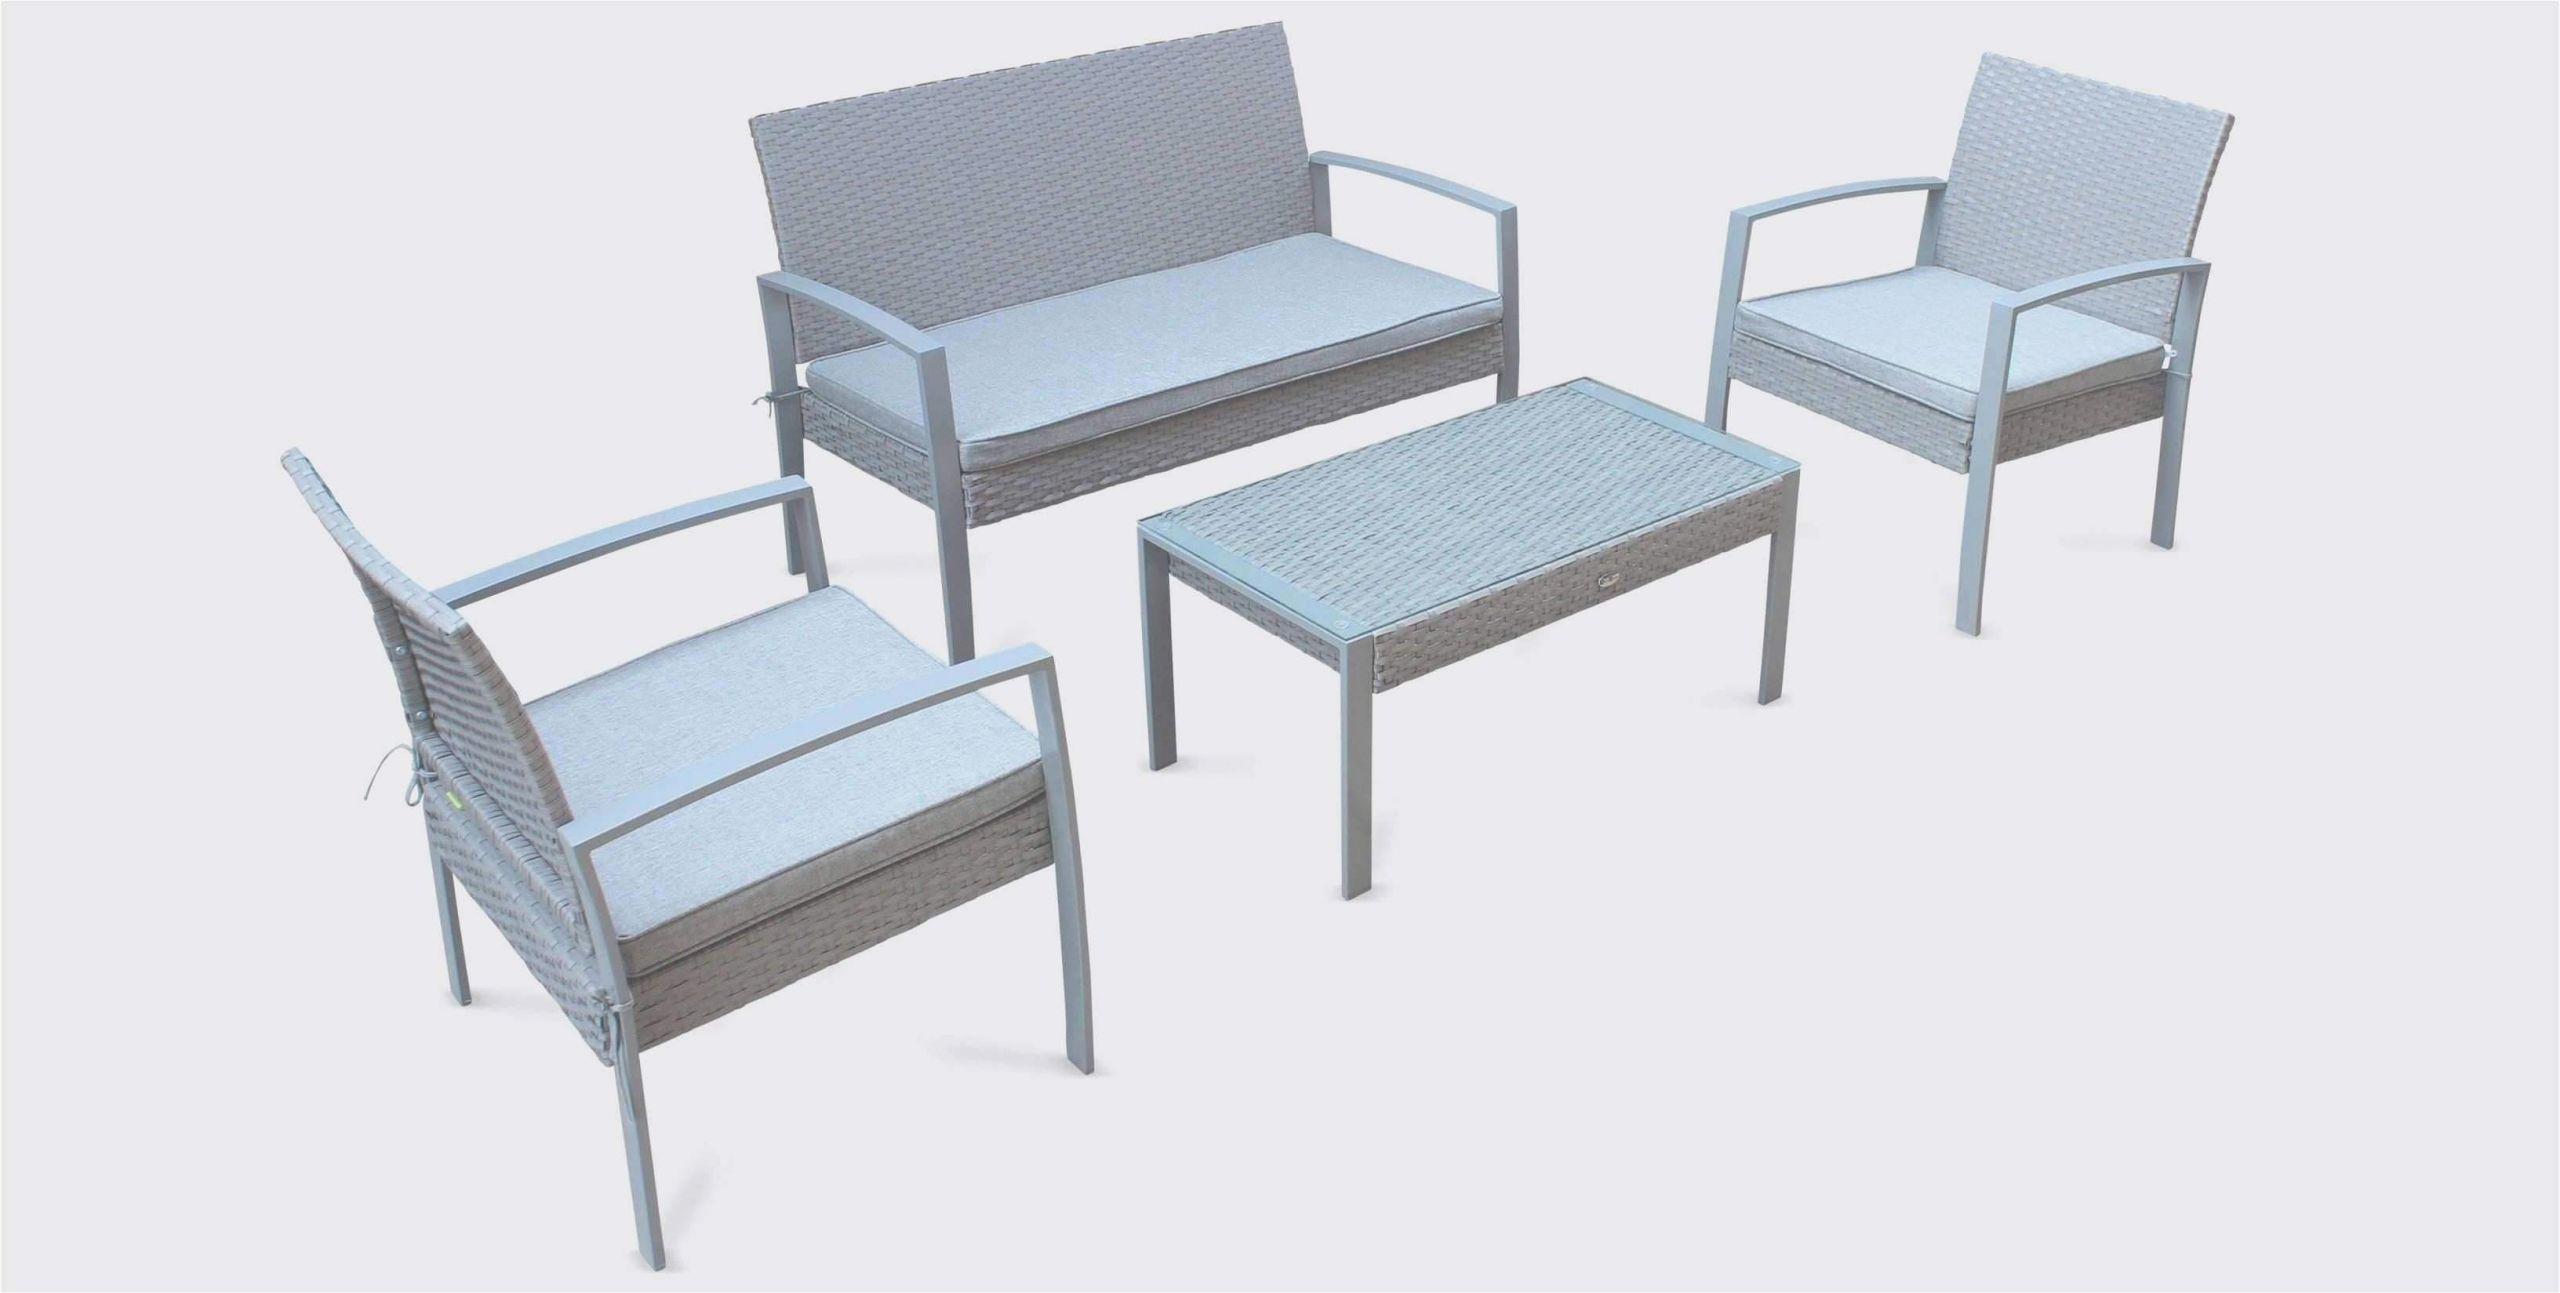 salon de jardin en metal elegant table jardin chaises de chaise elegant table jardin meilleur de of salon de jardin en metal